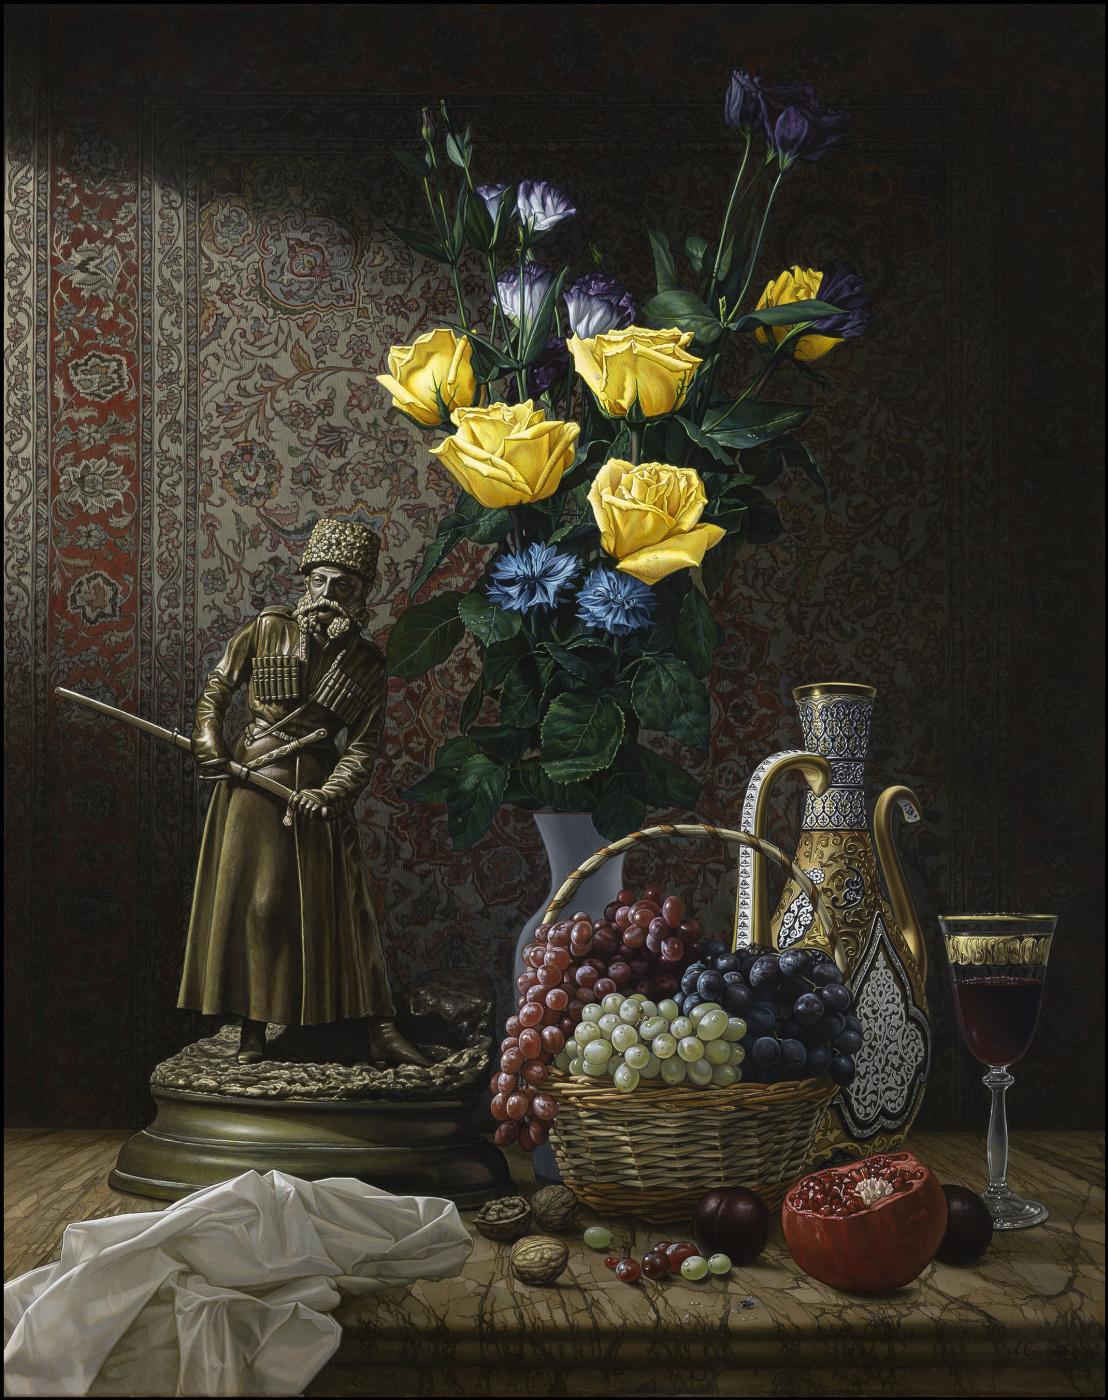 Alexander Mikhailovich Sushenok. Gifts of the Caucasus